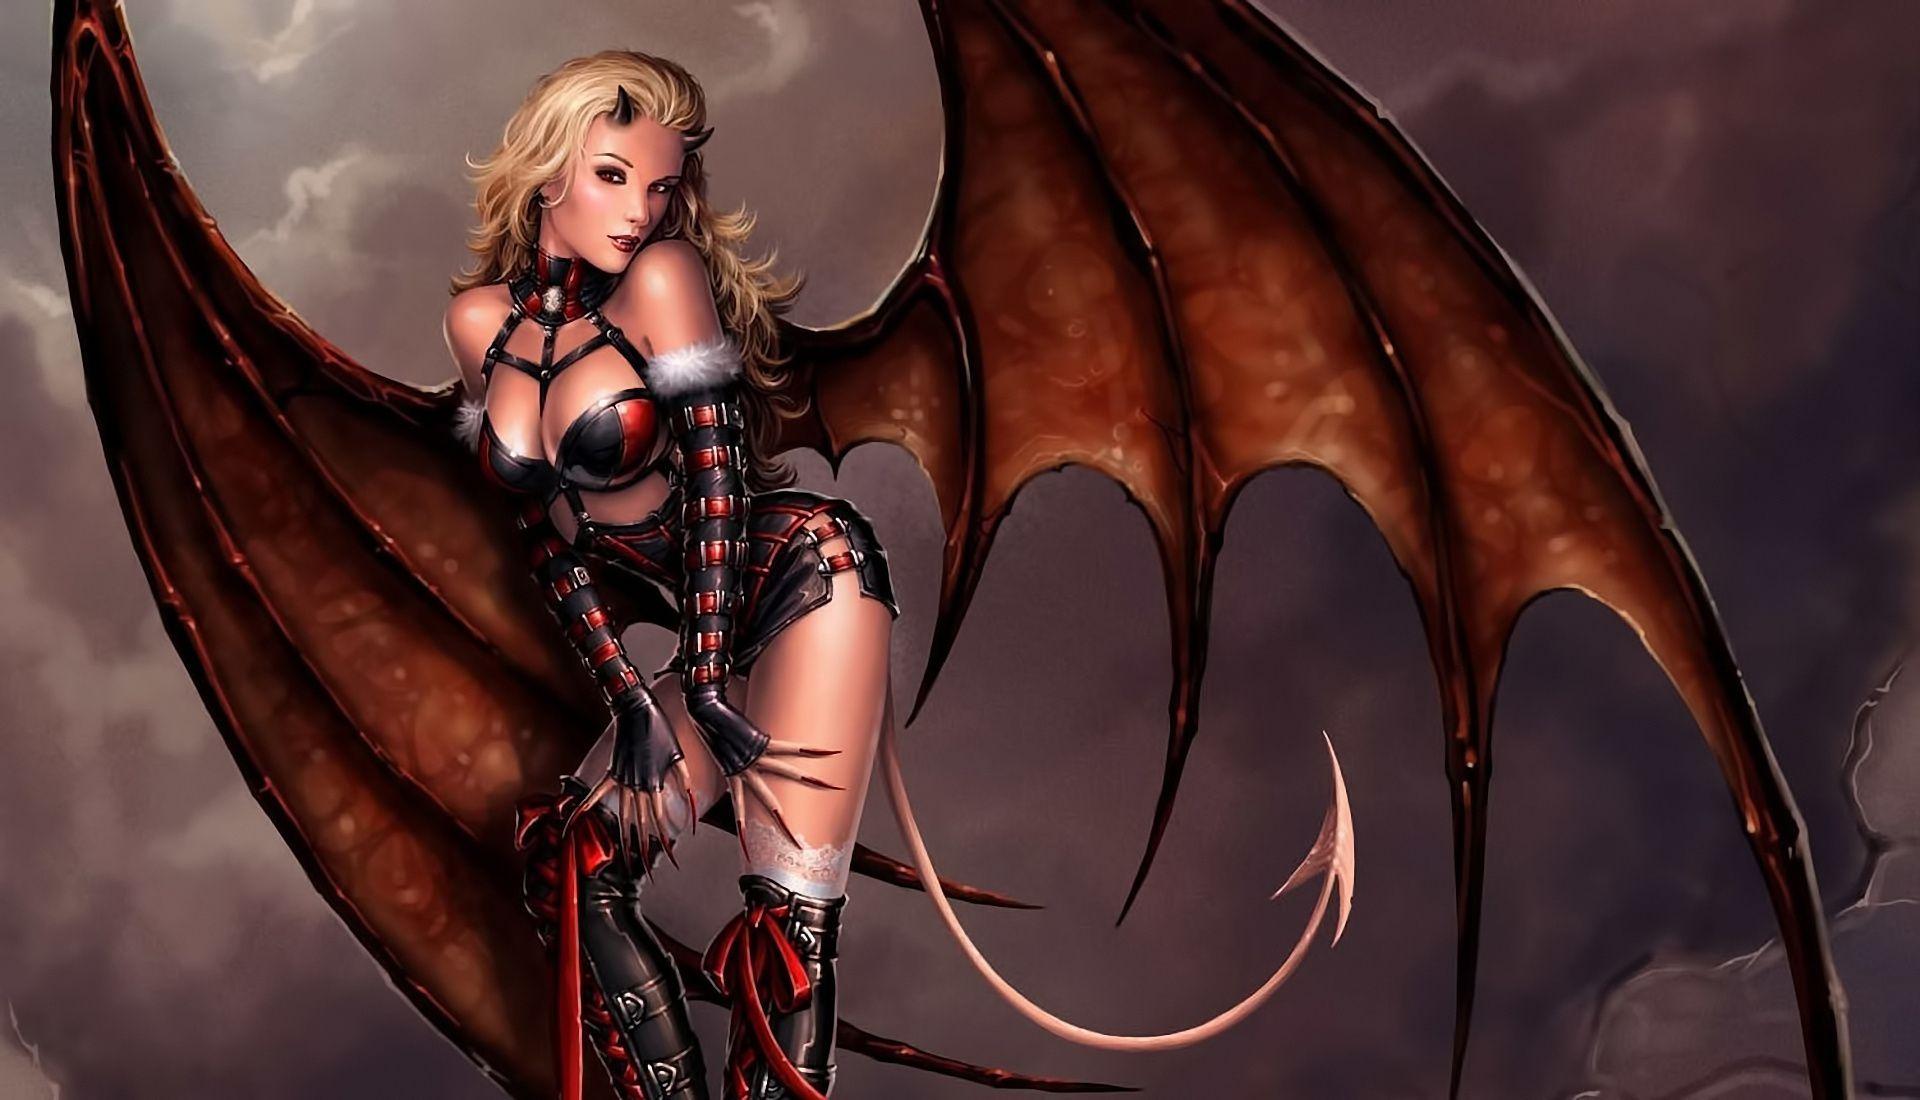 Картинки дьяволы девушки